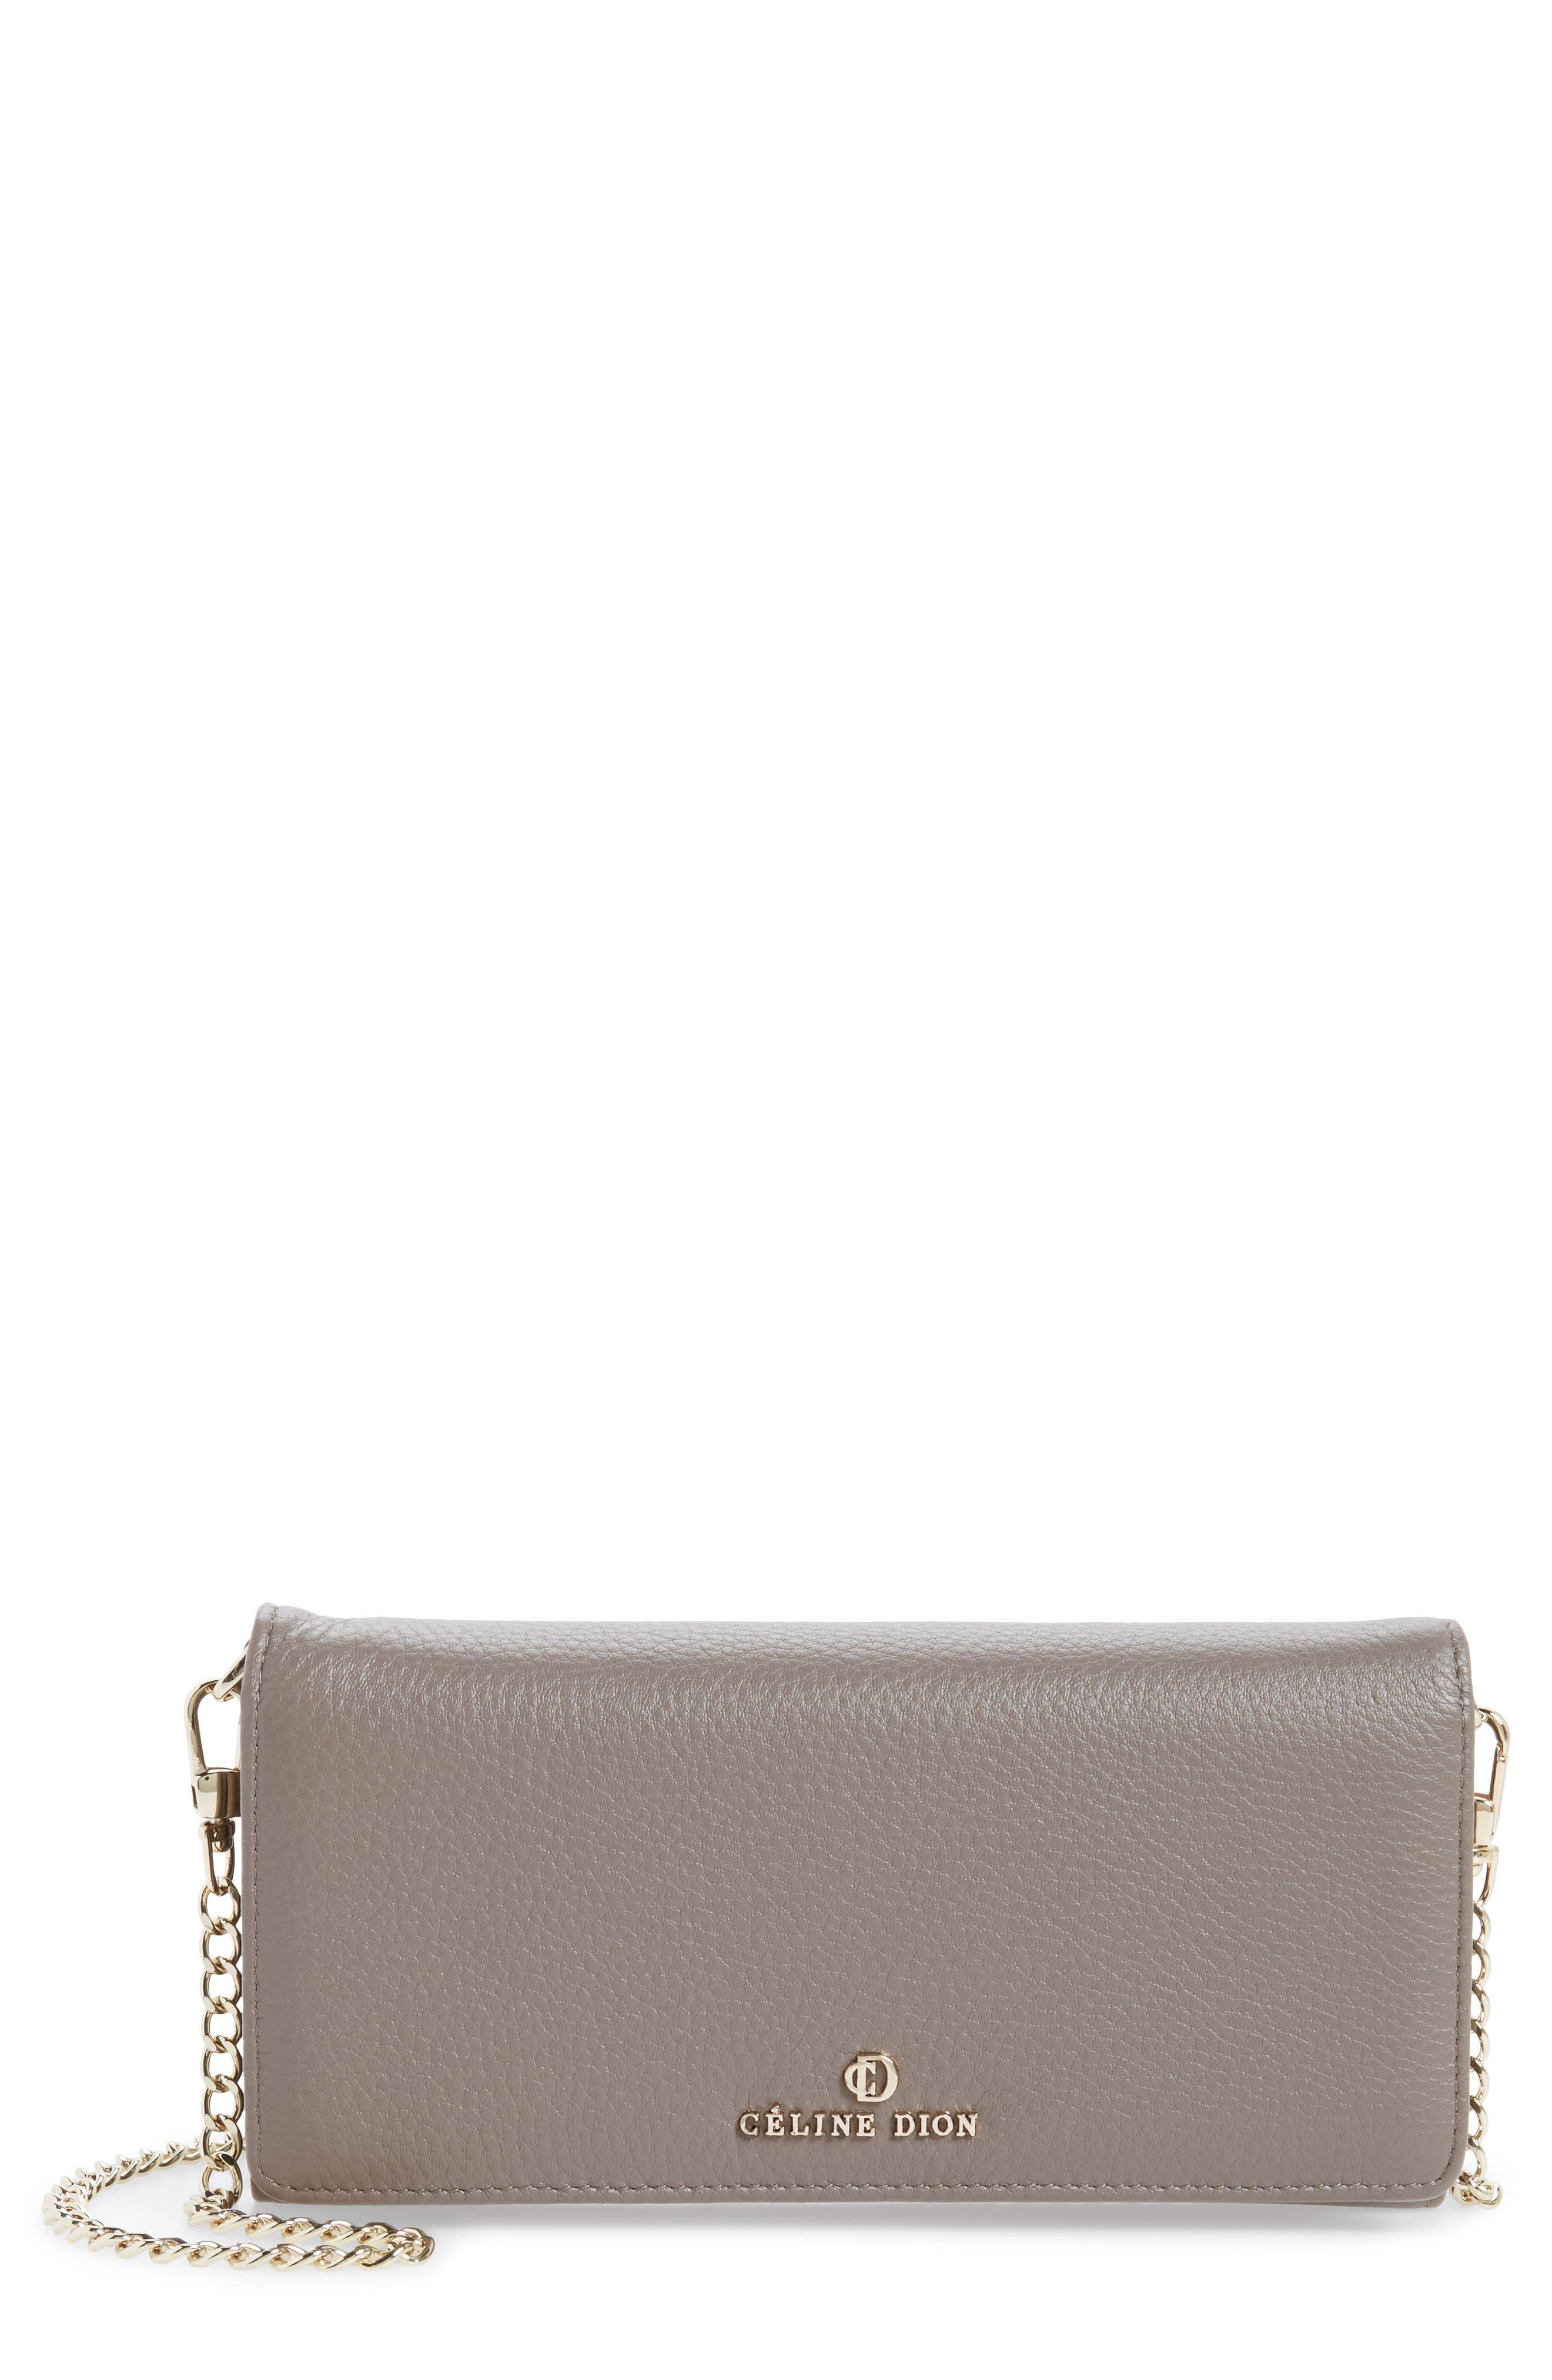 Céline Dion Adagio Leather Crossbody Wallet